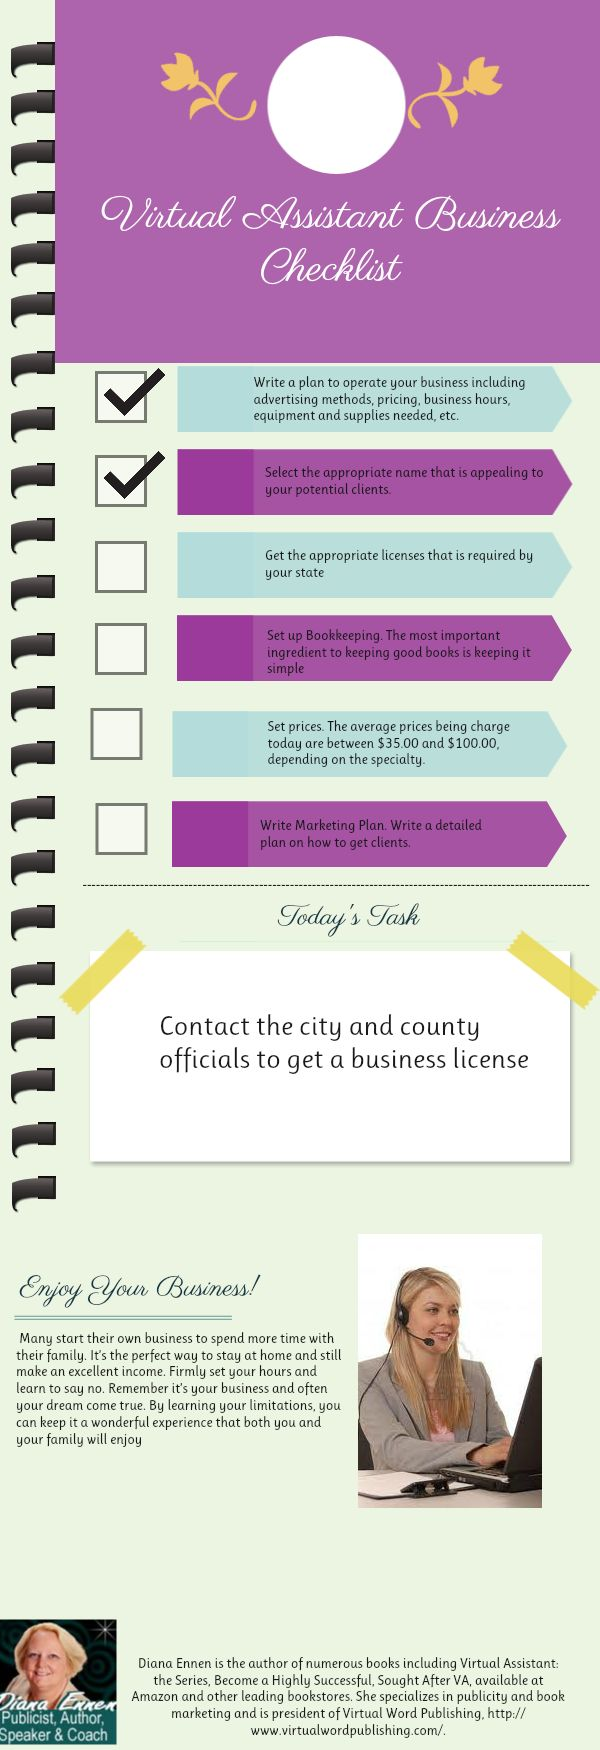 #vatip Virtual Assistant Business Checklist